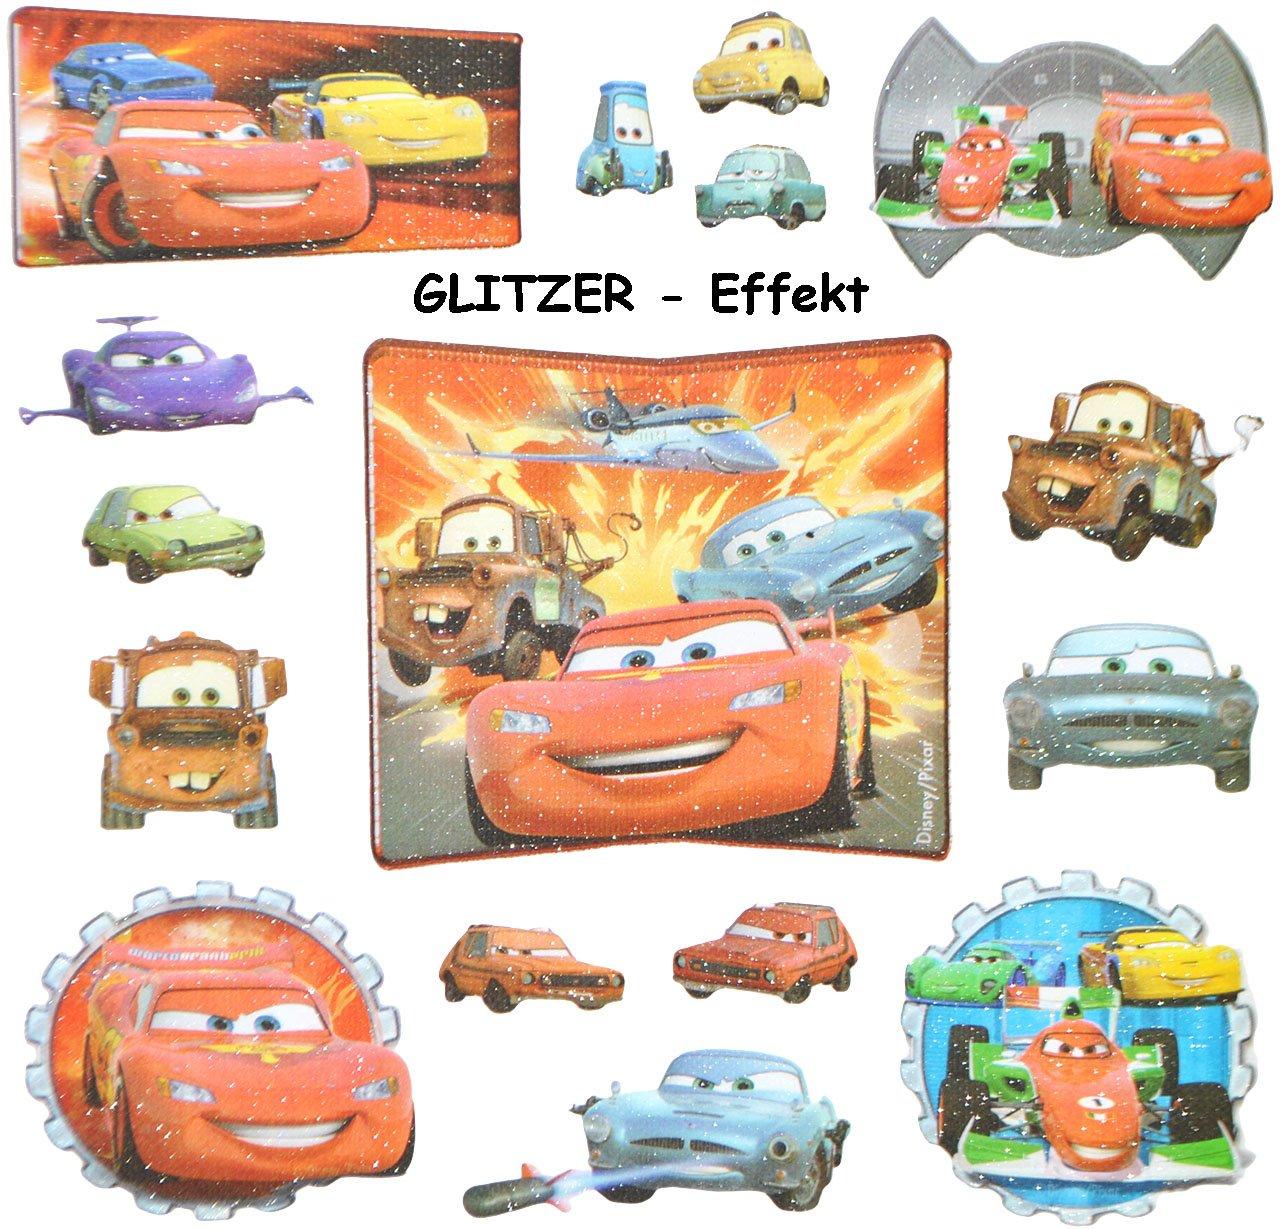 16 Stk. 3-D Sticker - Disney Cars Lightning McQueen - Aufkleber für ...